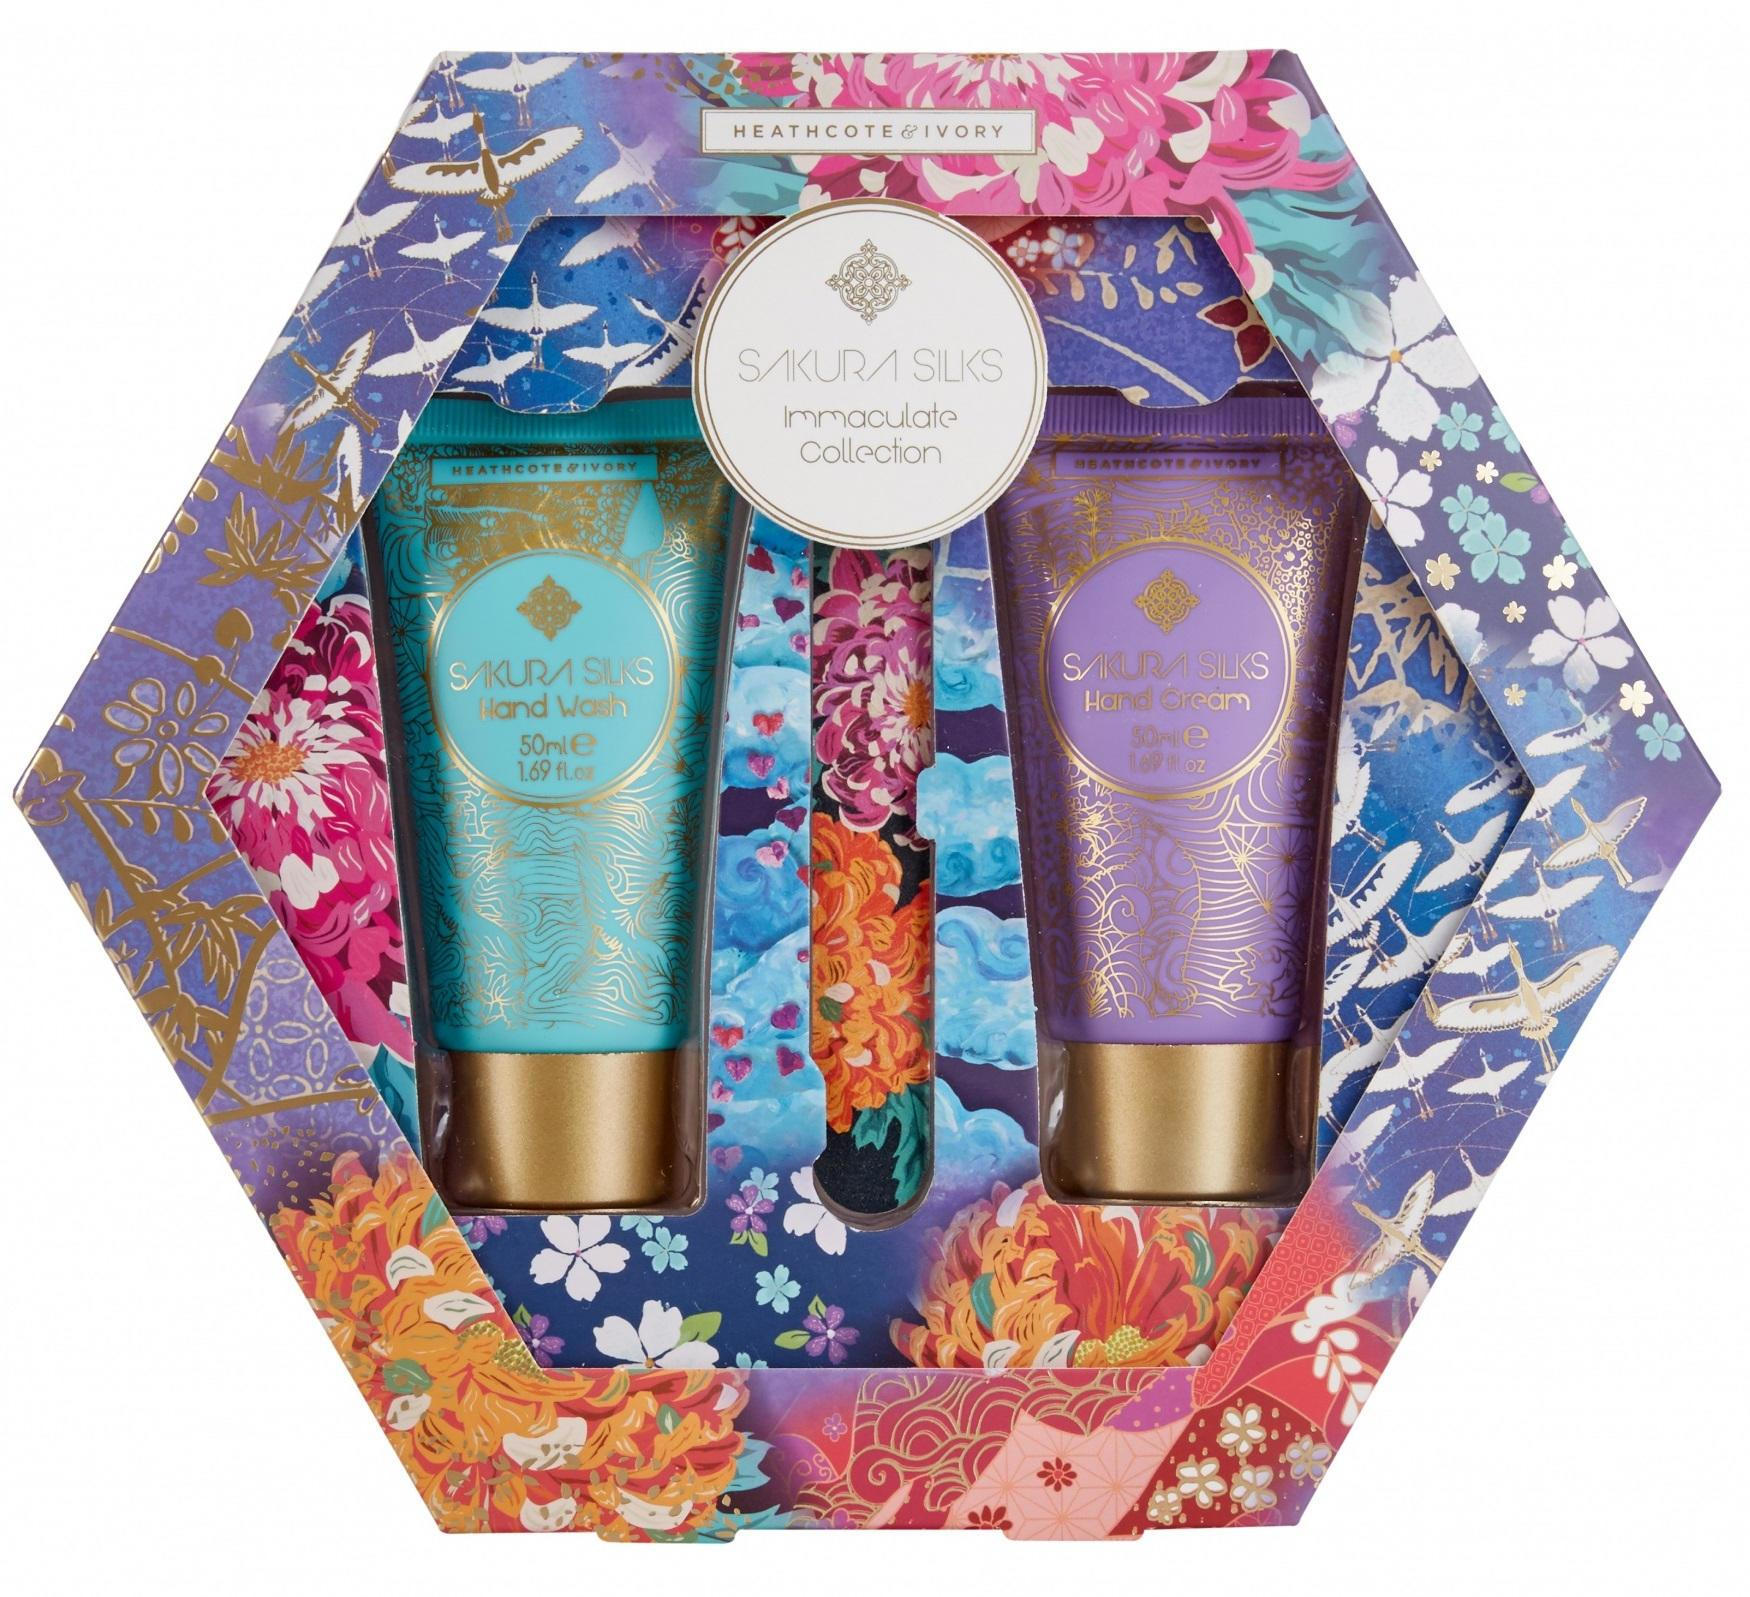 HEATHCOTE & IVORY Dárková sada pro péči o ruce Sakura Silks, růžová barva, fialová barva, modrá barva, multi barva, zlatá barva, plast, papír